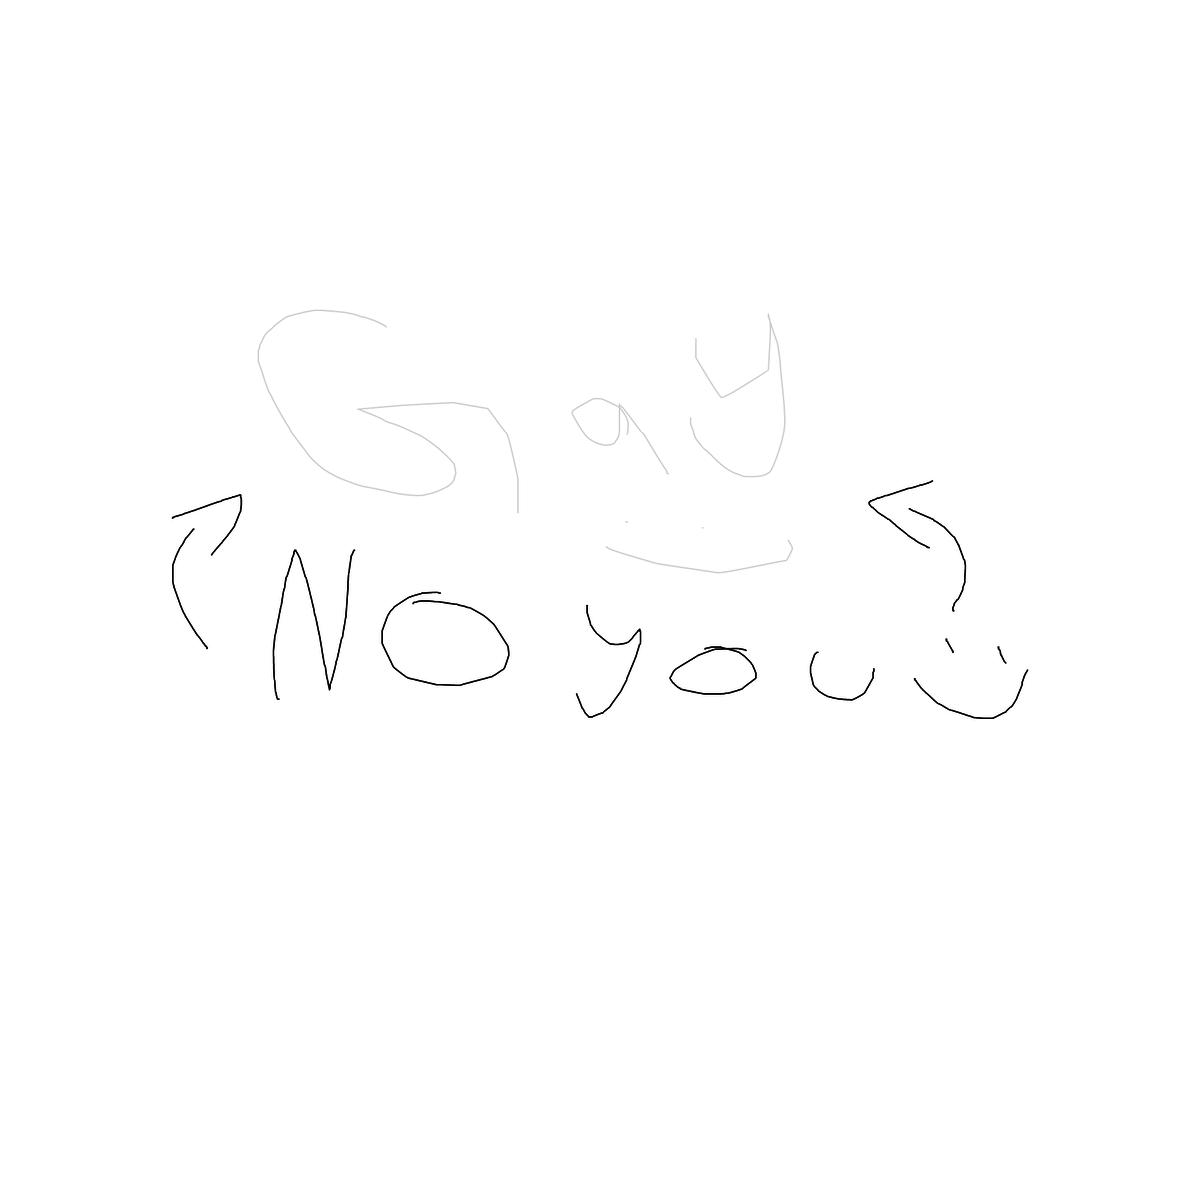 BAAAM drawing#23323 lat:53.1282806396484400lng: -1.0376820564270020